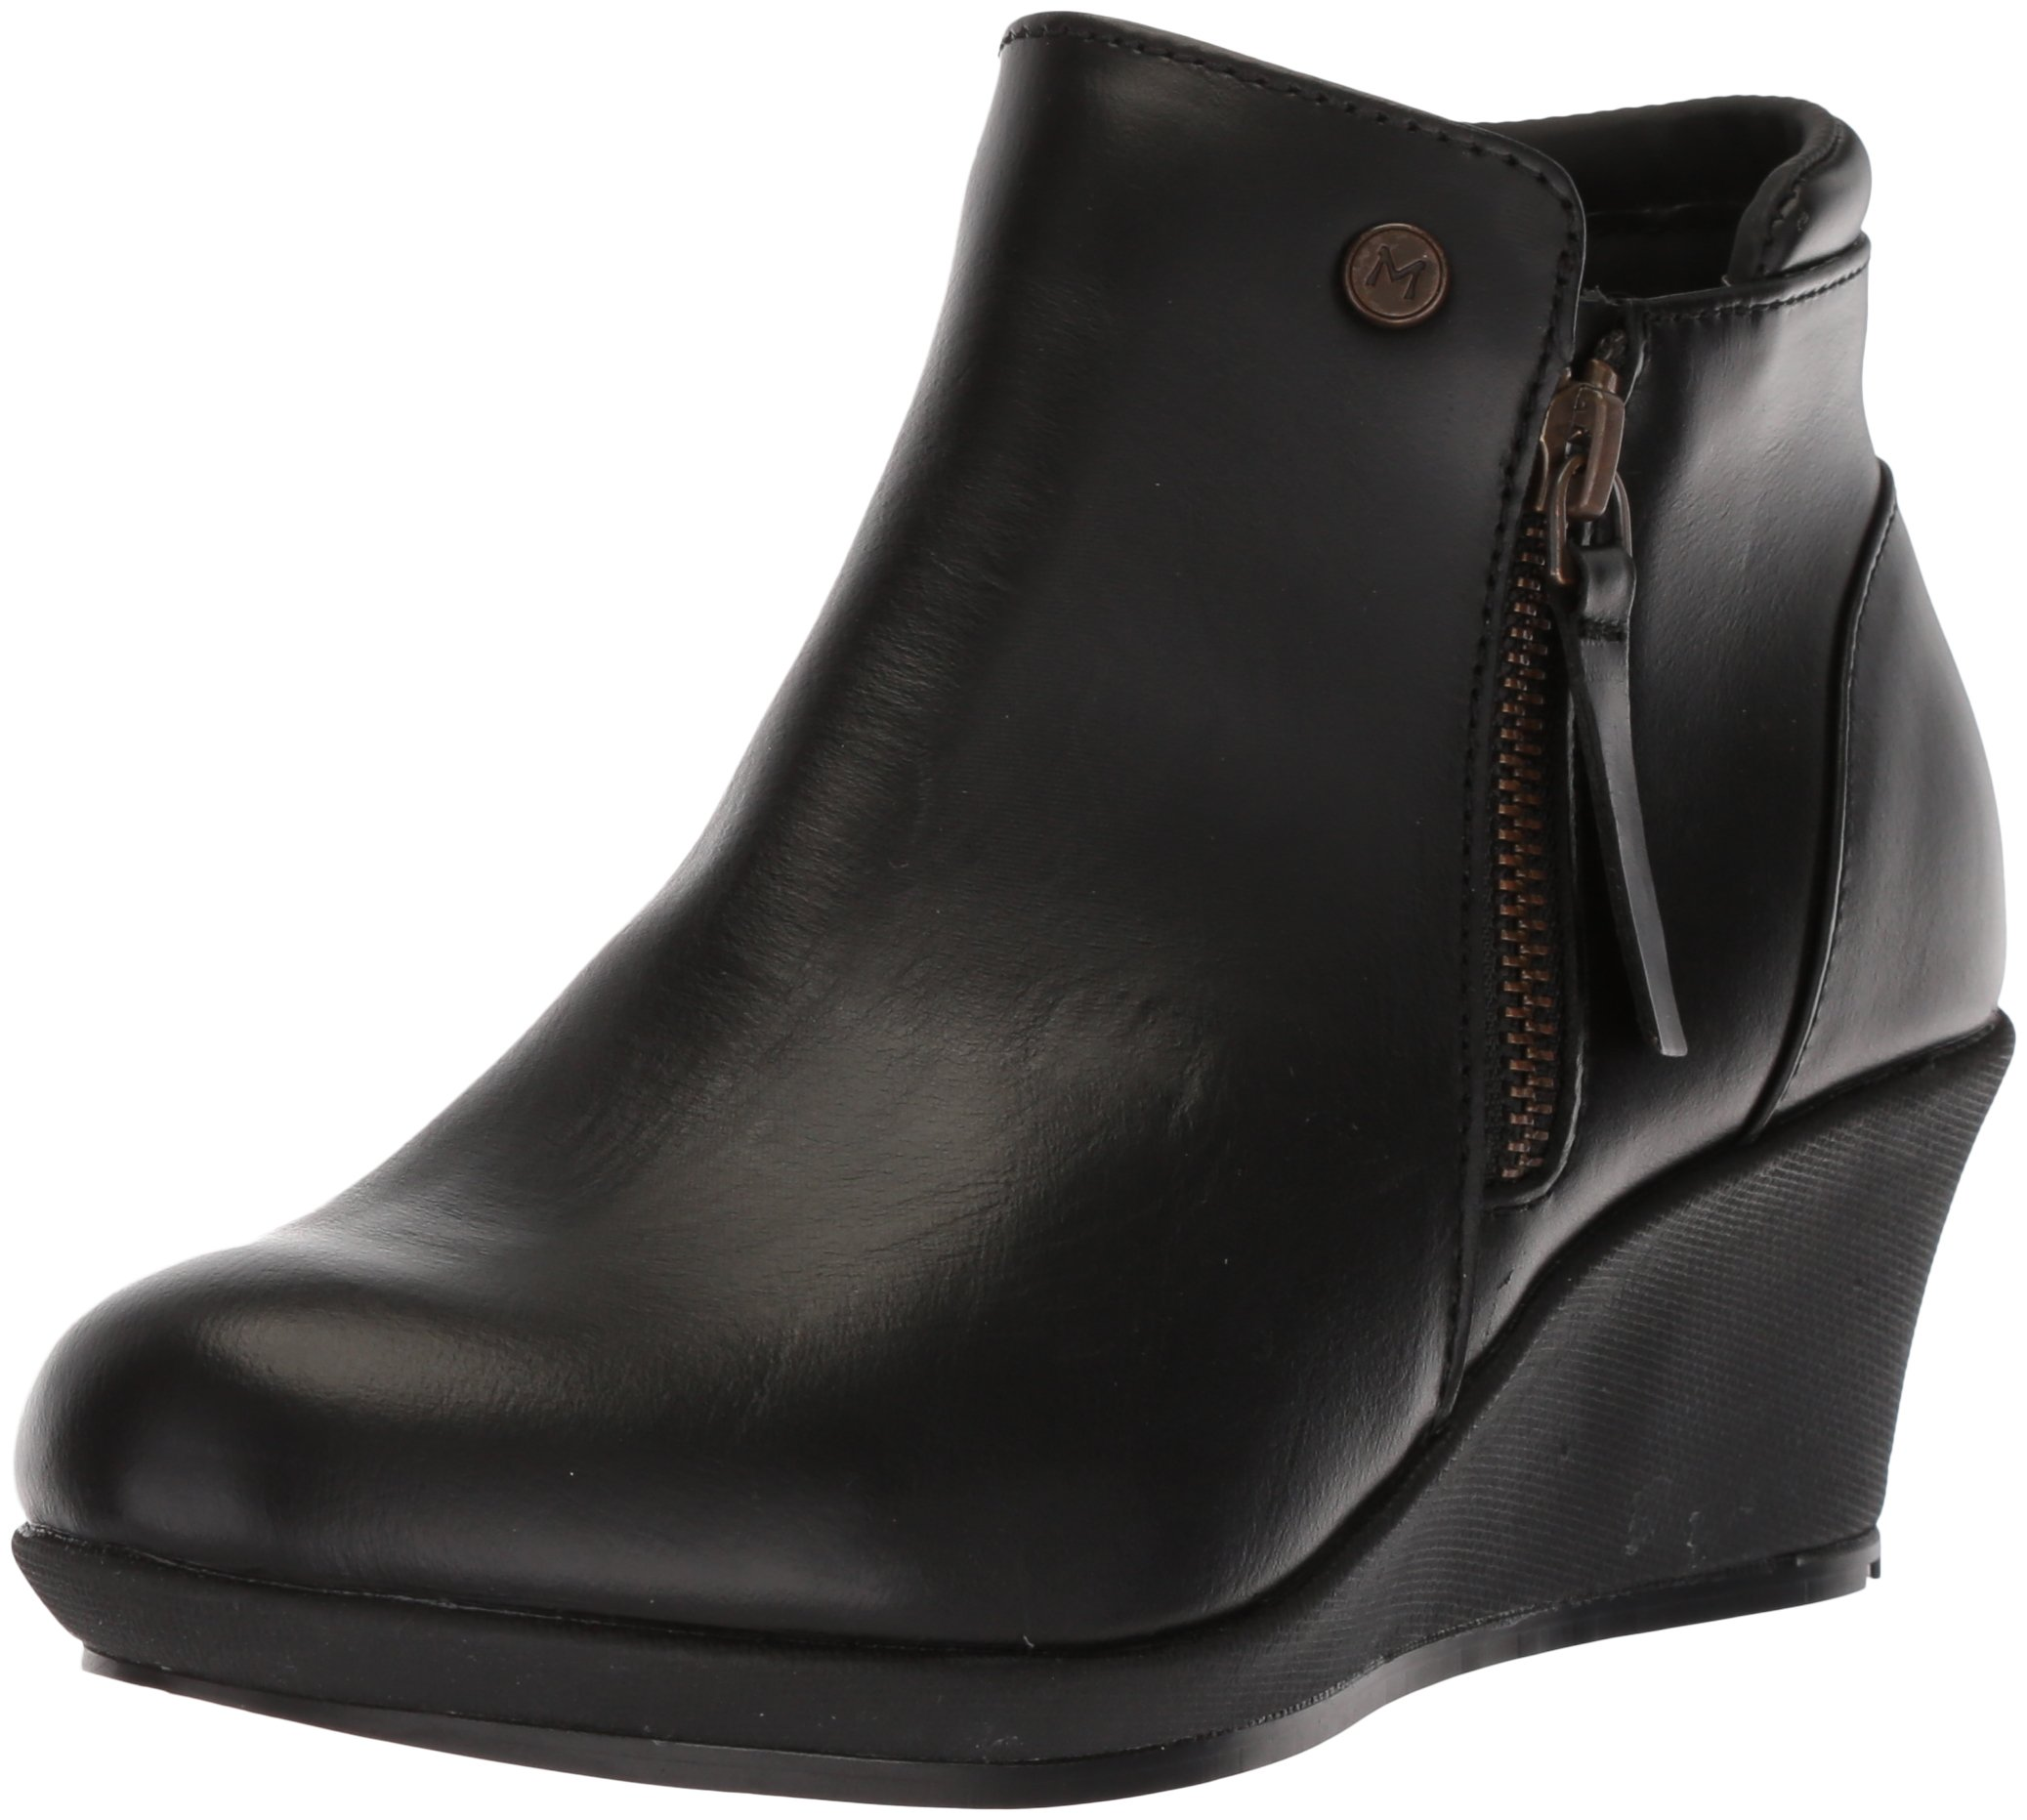 MOZO Women's LOLA Food Service Shoe, Black, 8.5 Medium US by MOZO